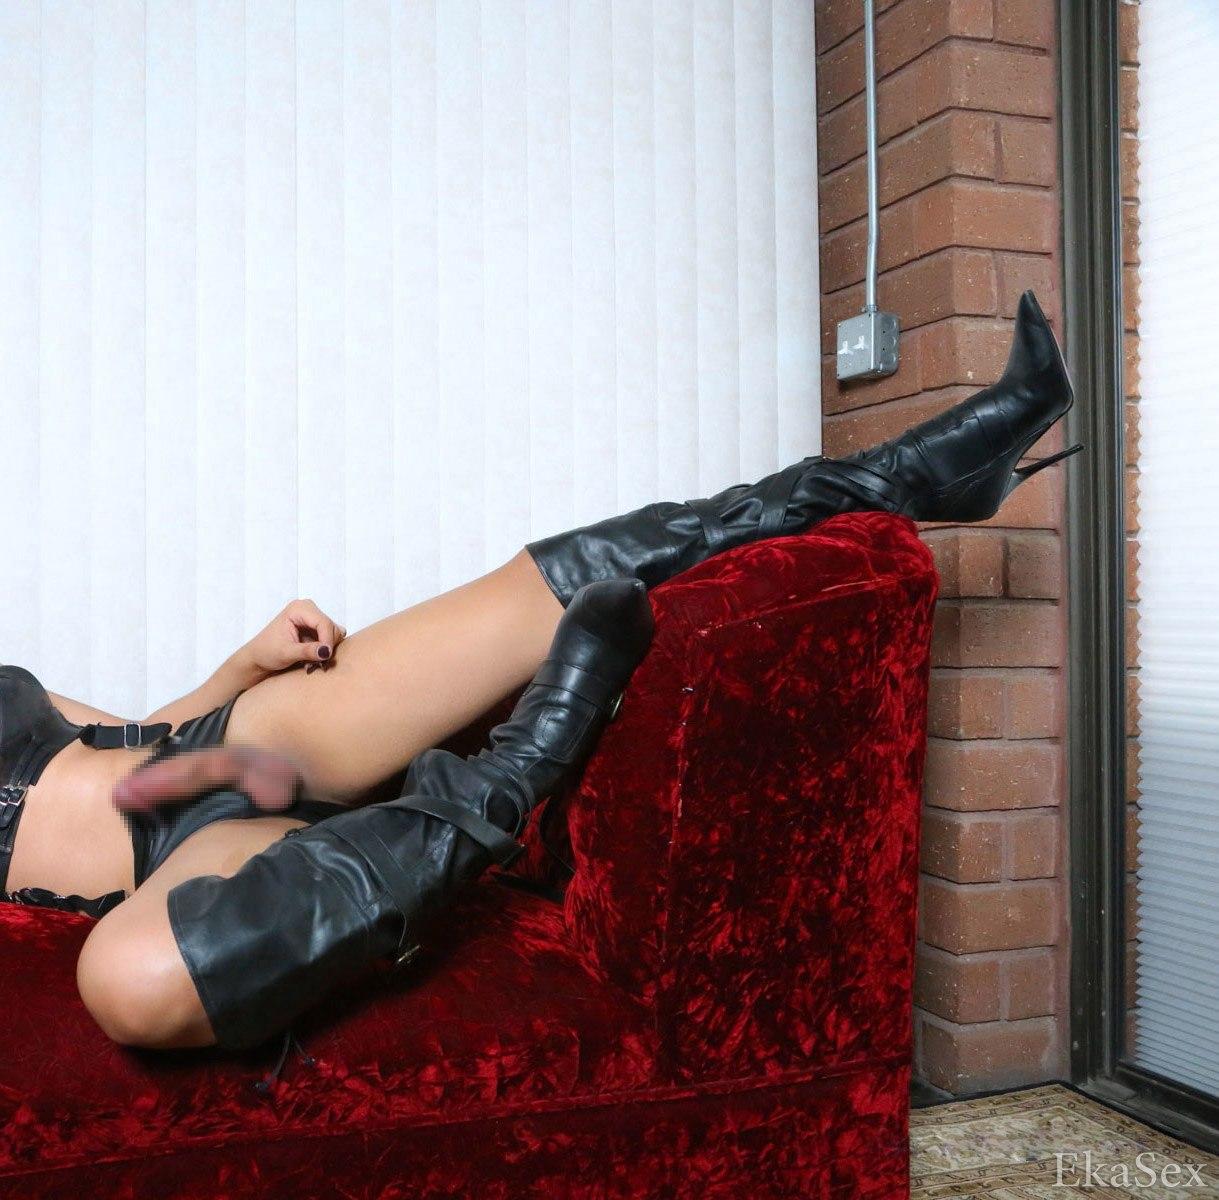 фото проститутки Транс БОМБА Лара из города Екатеринбург